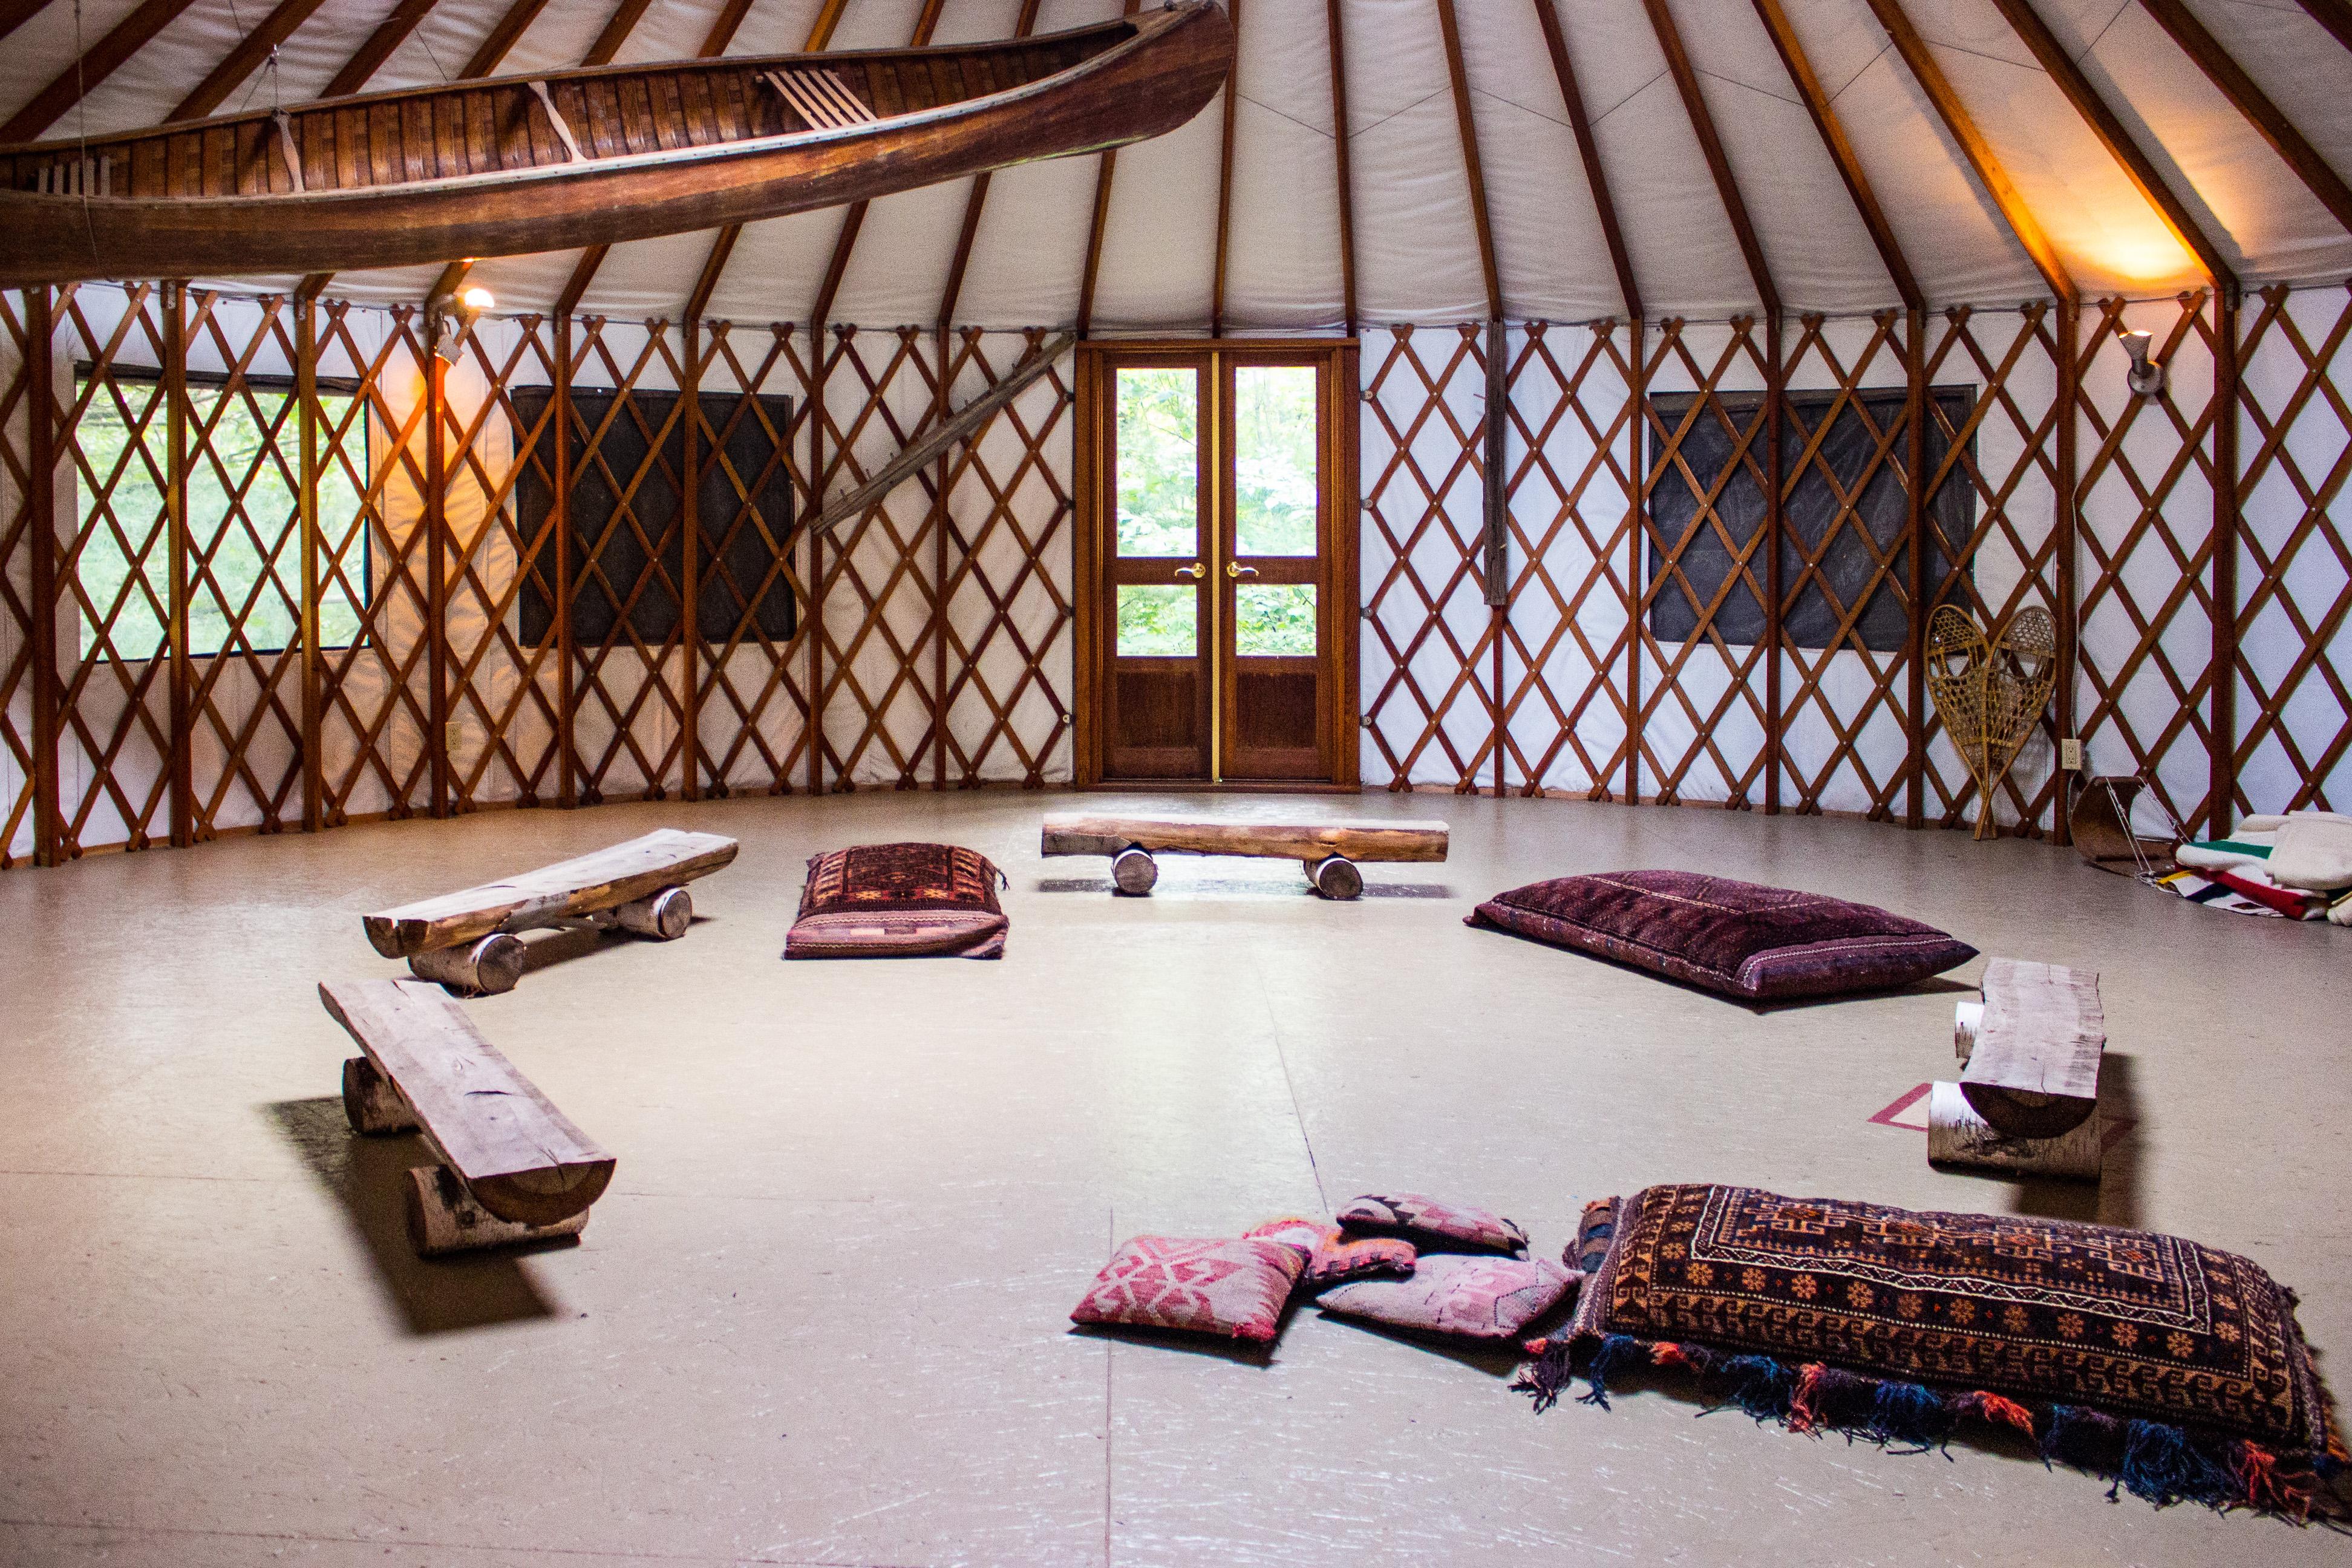 Waterloo yoga, mandy meditation retreat, womens retreat waterloo, meditation, meditation retreat, retreat waterloo ontario, yoga hamilton ontario, hamilton yoga